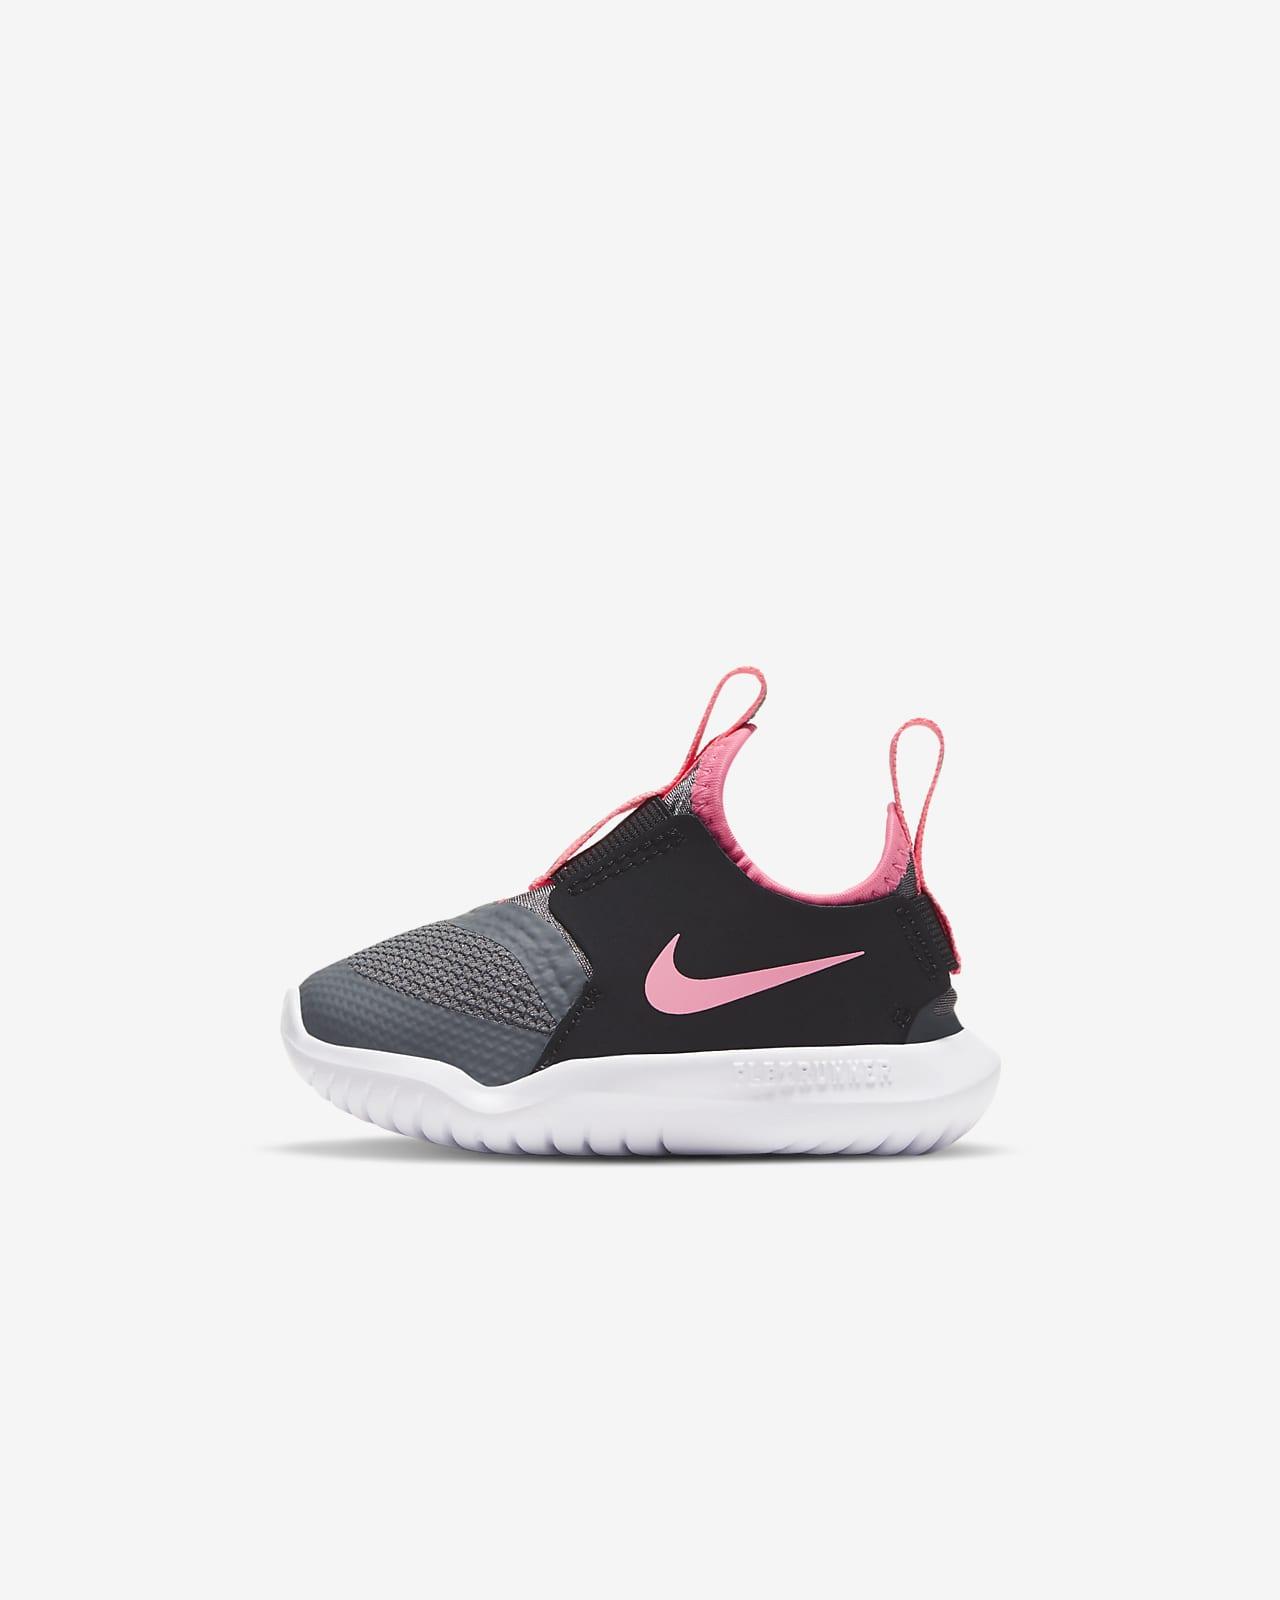 Nike Flex Runner Baby and Toddler Shoe